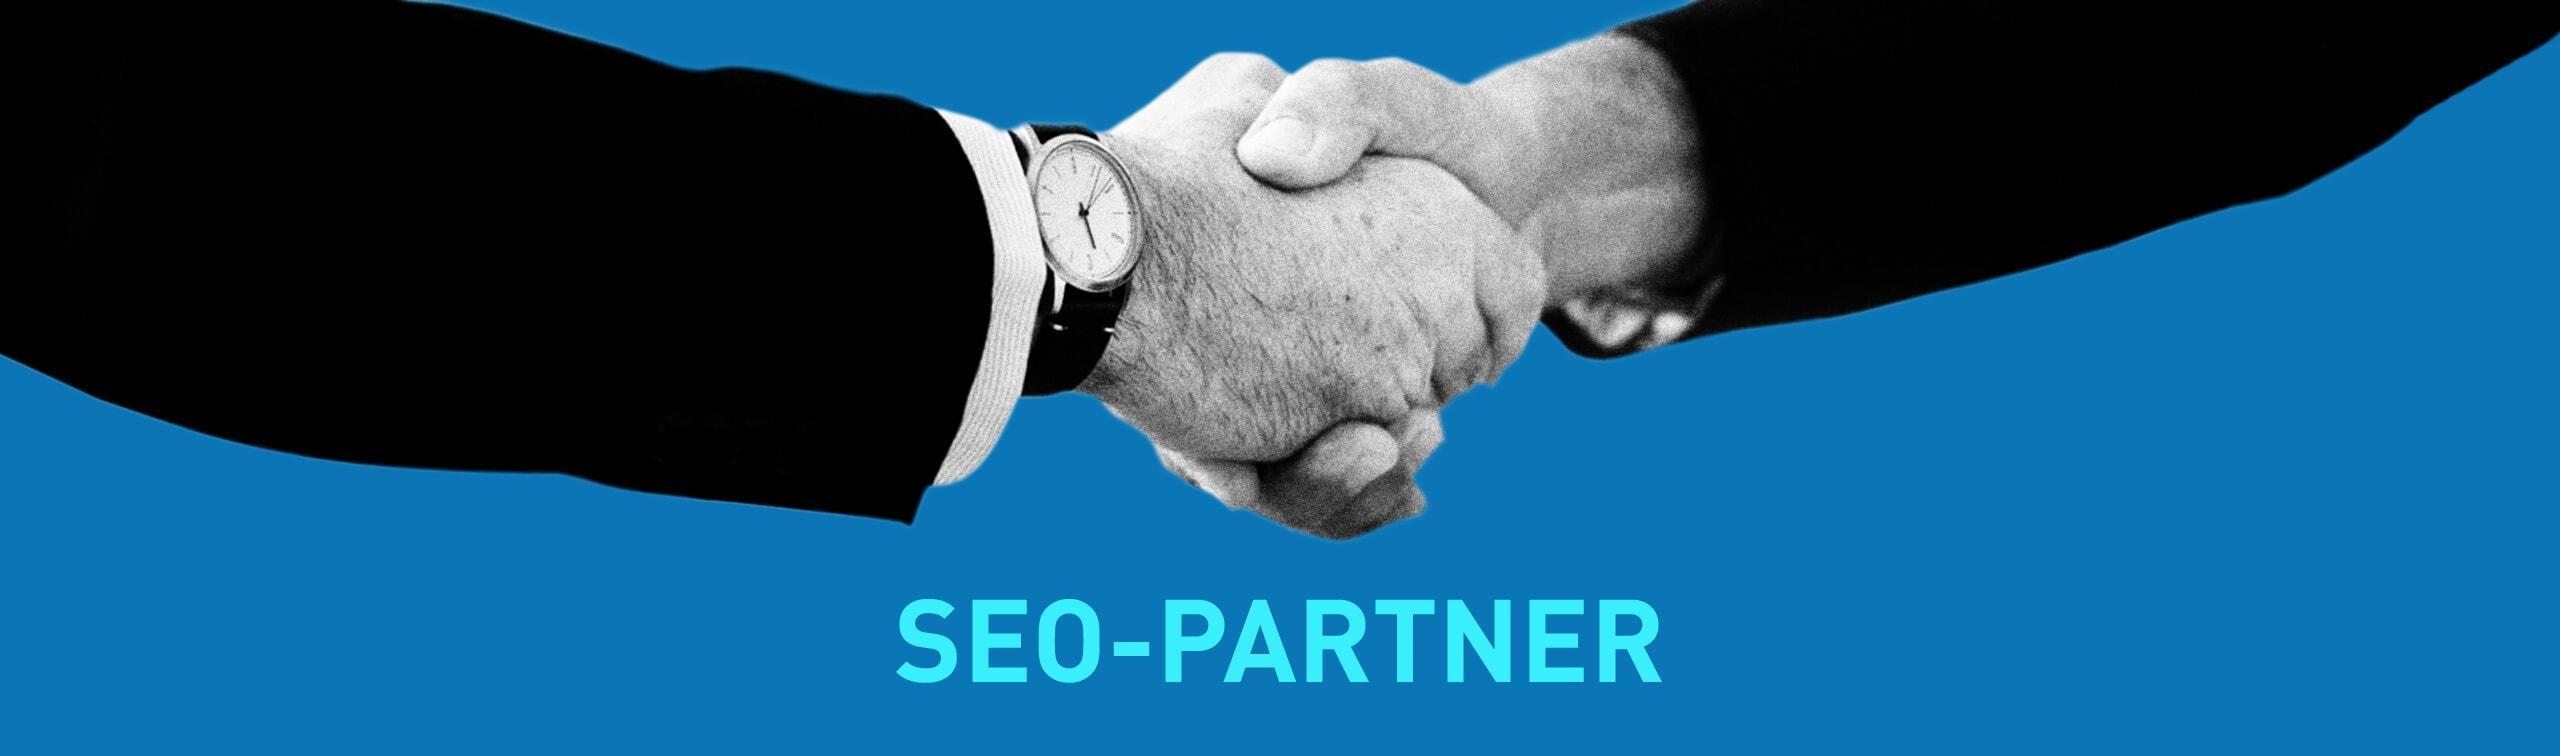 SEO-Partner